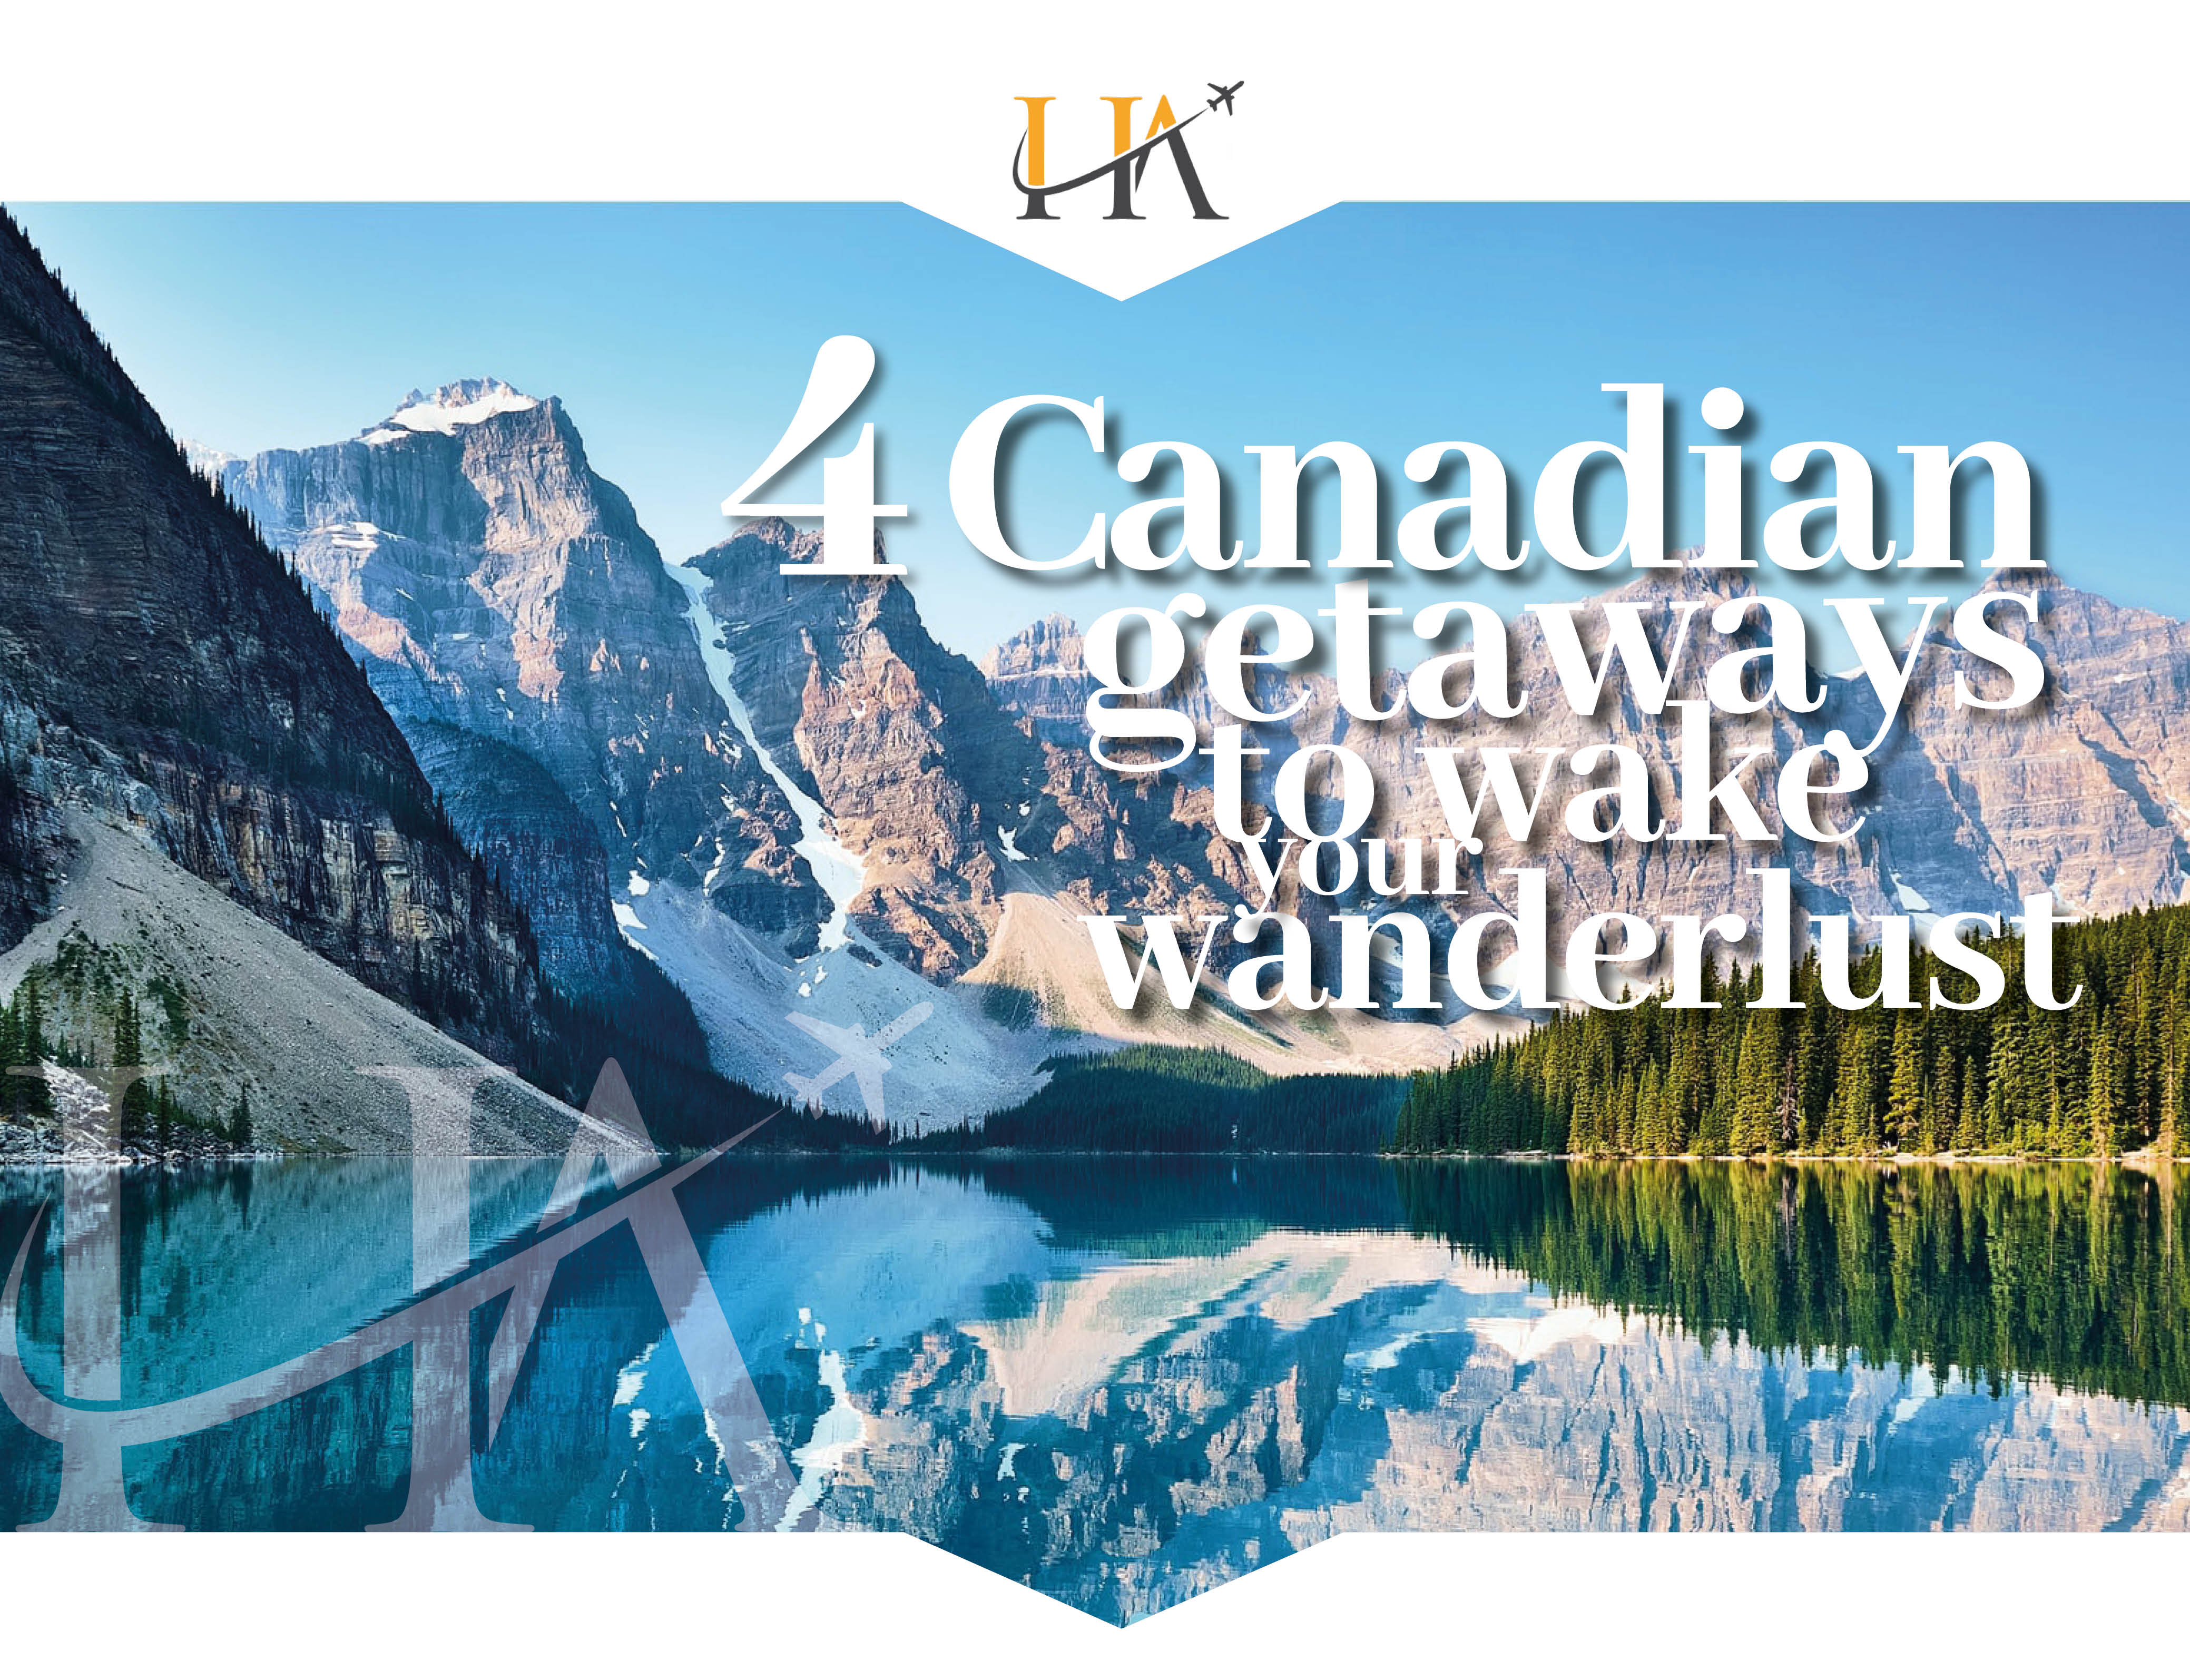 4 Canada holidays to inspire